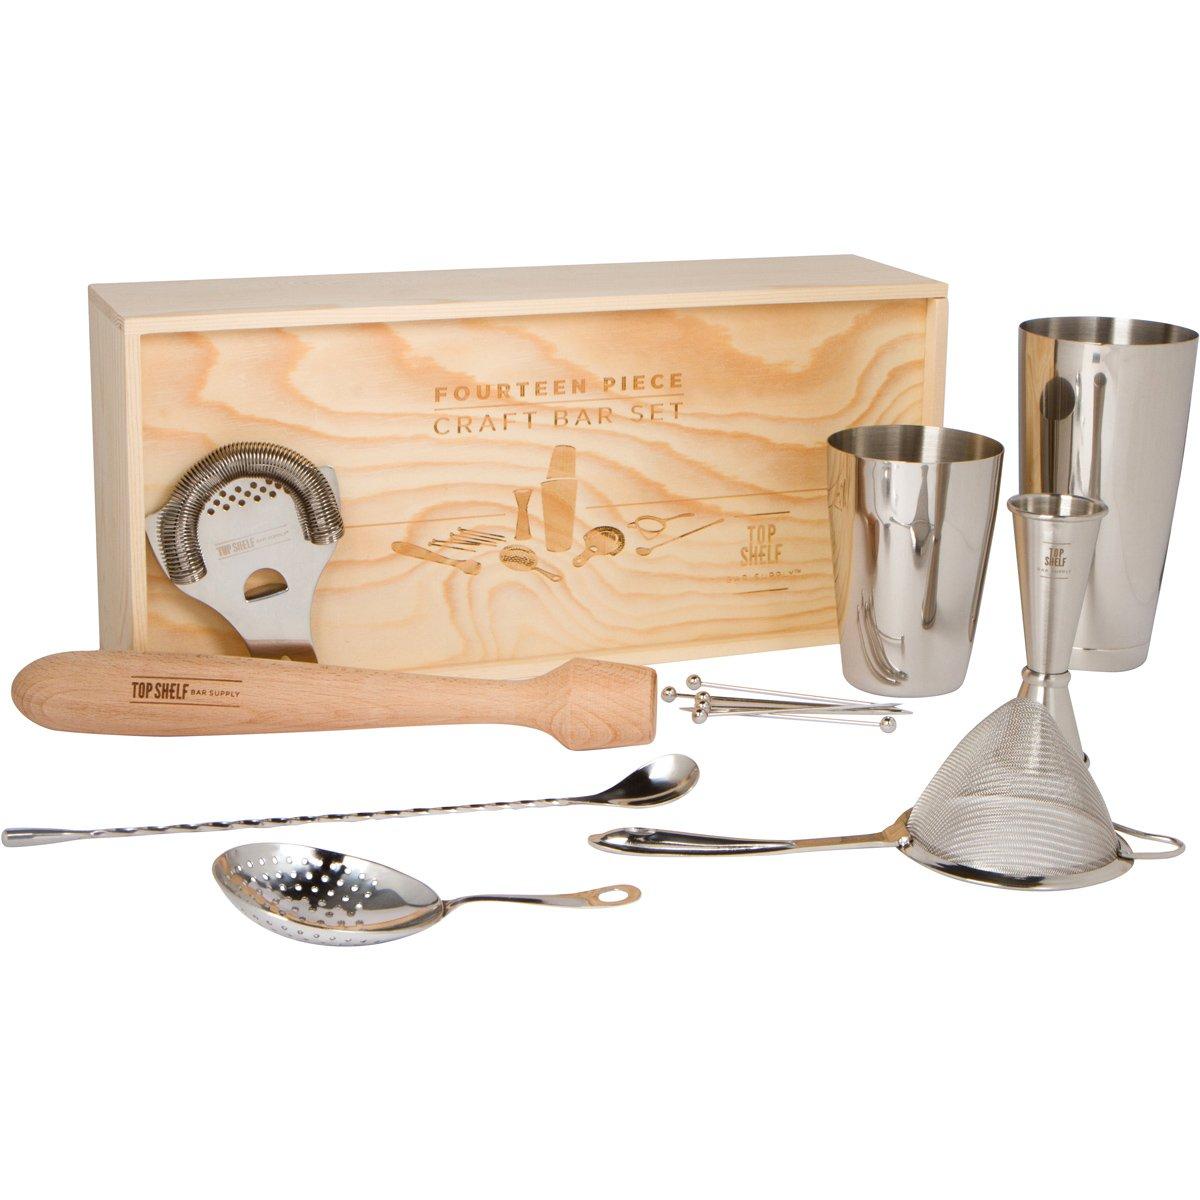 Craft Bar Set: Set of 14 Pro Bar Tools for Bartender and Home Bars Top Shelf Bar Supply